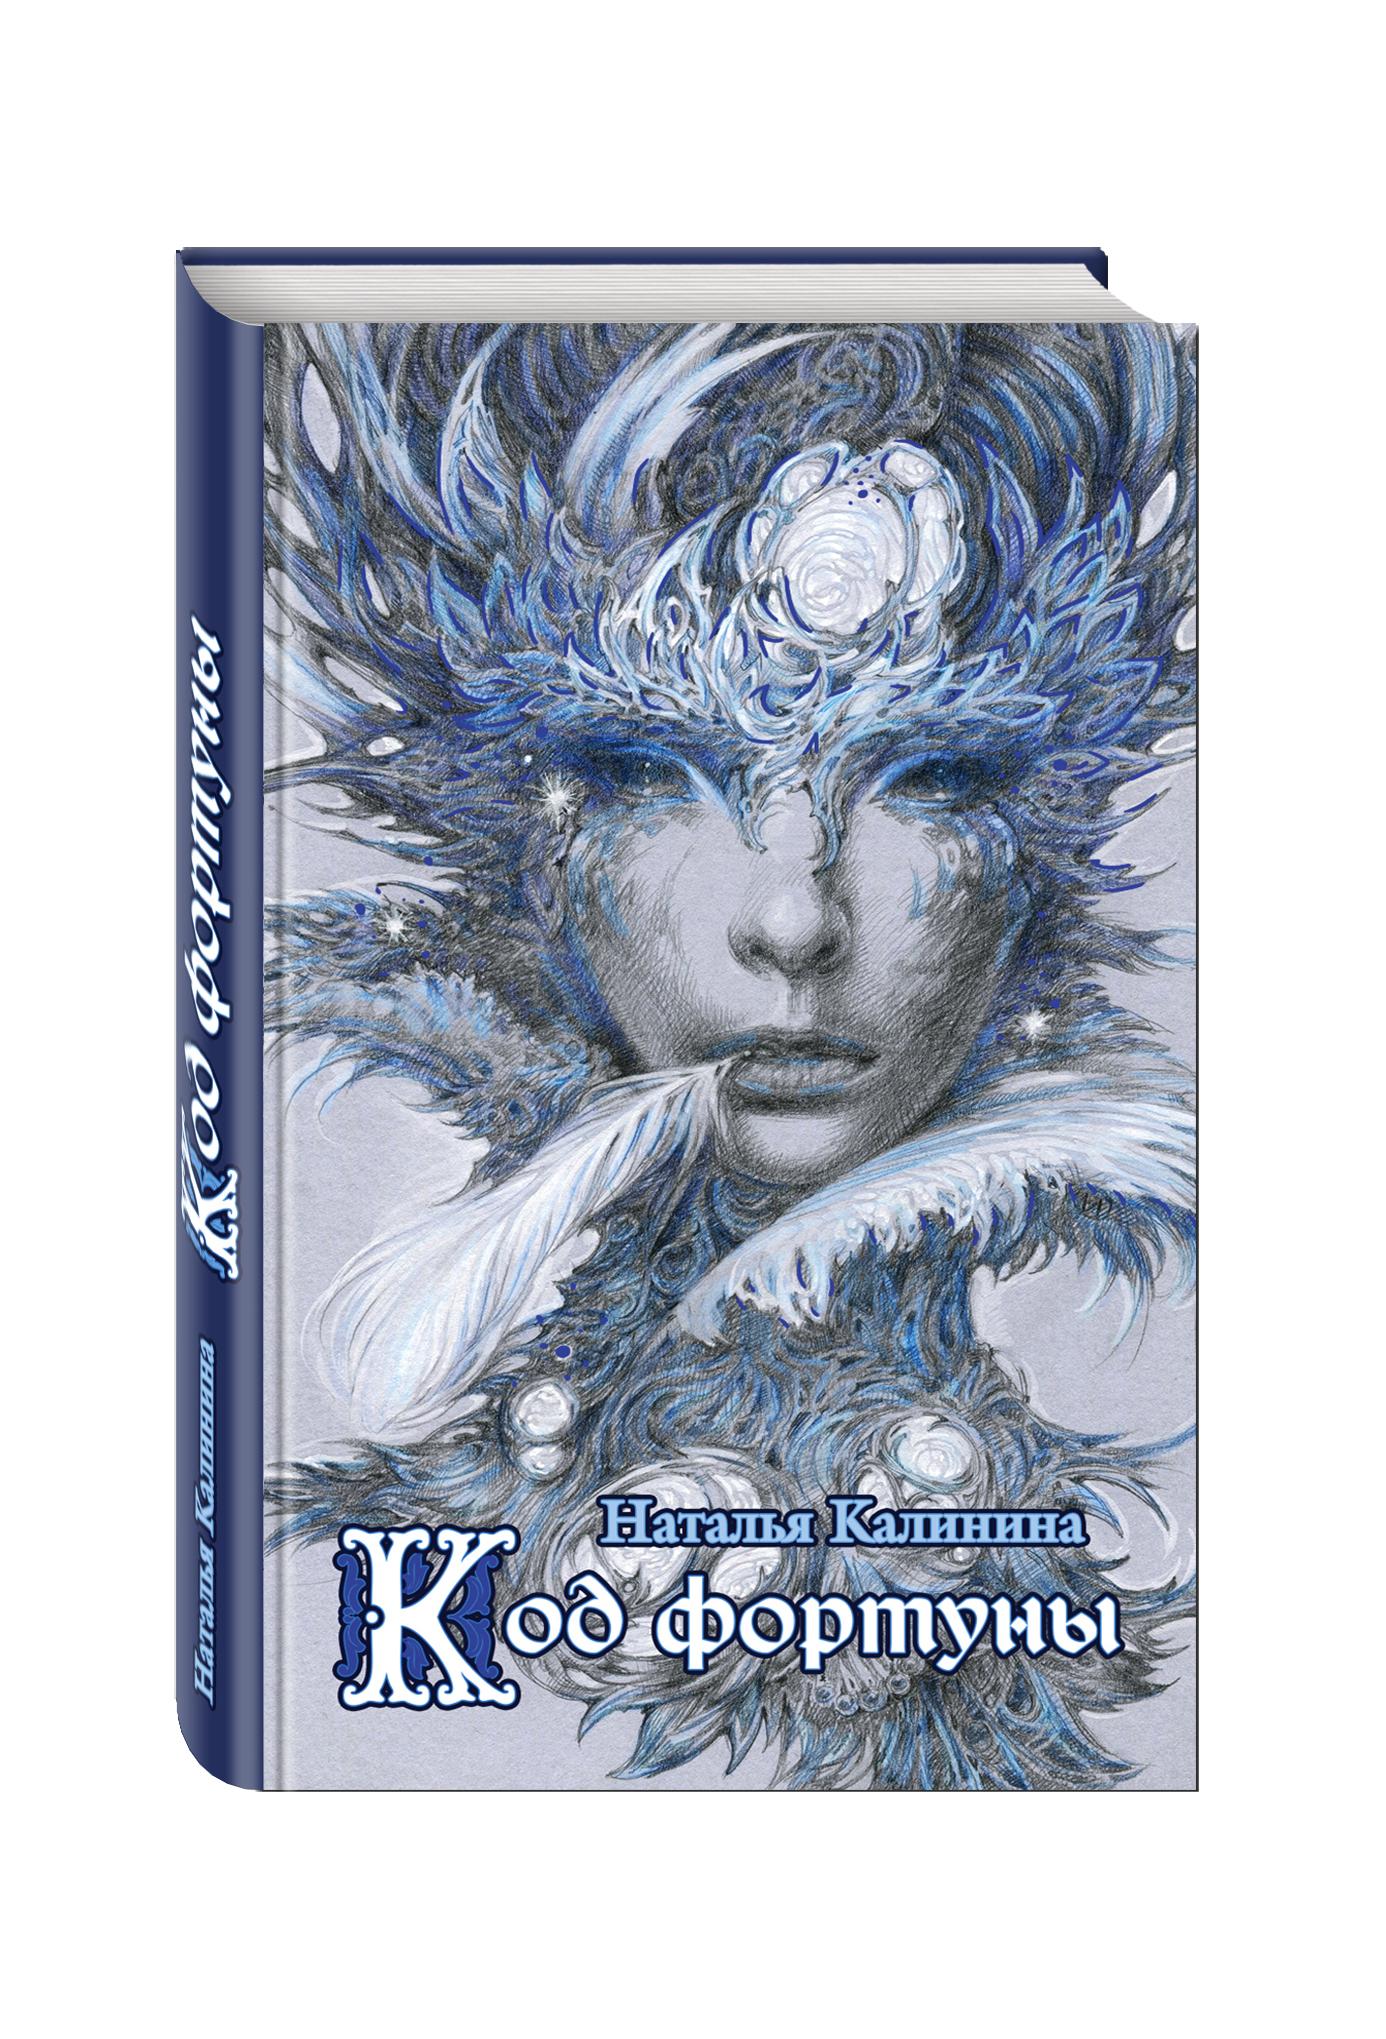 Калинина Н.Д. Код фортуны стервятники